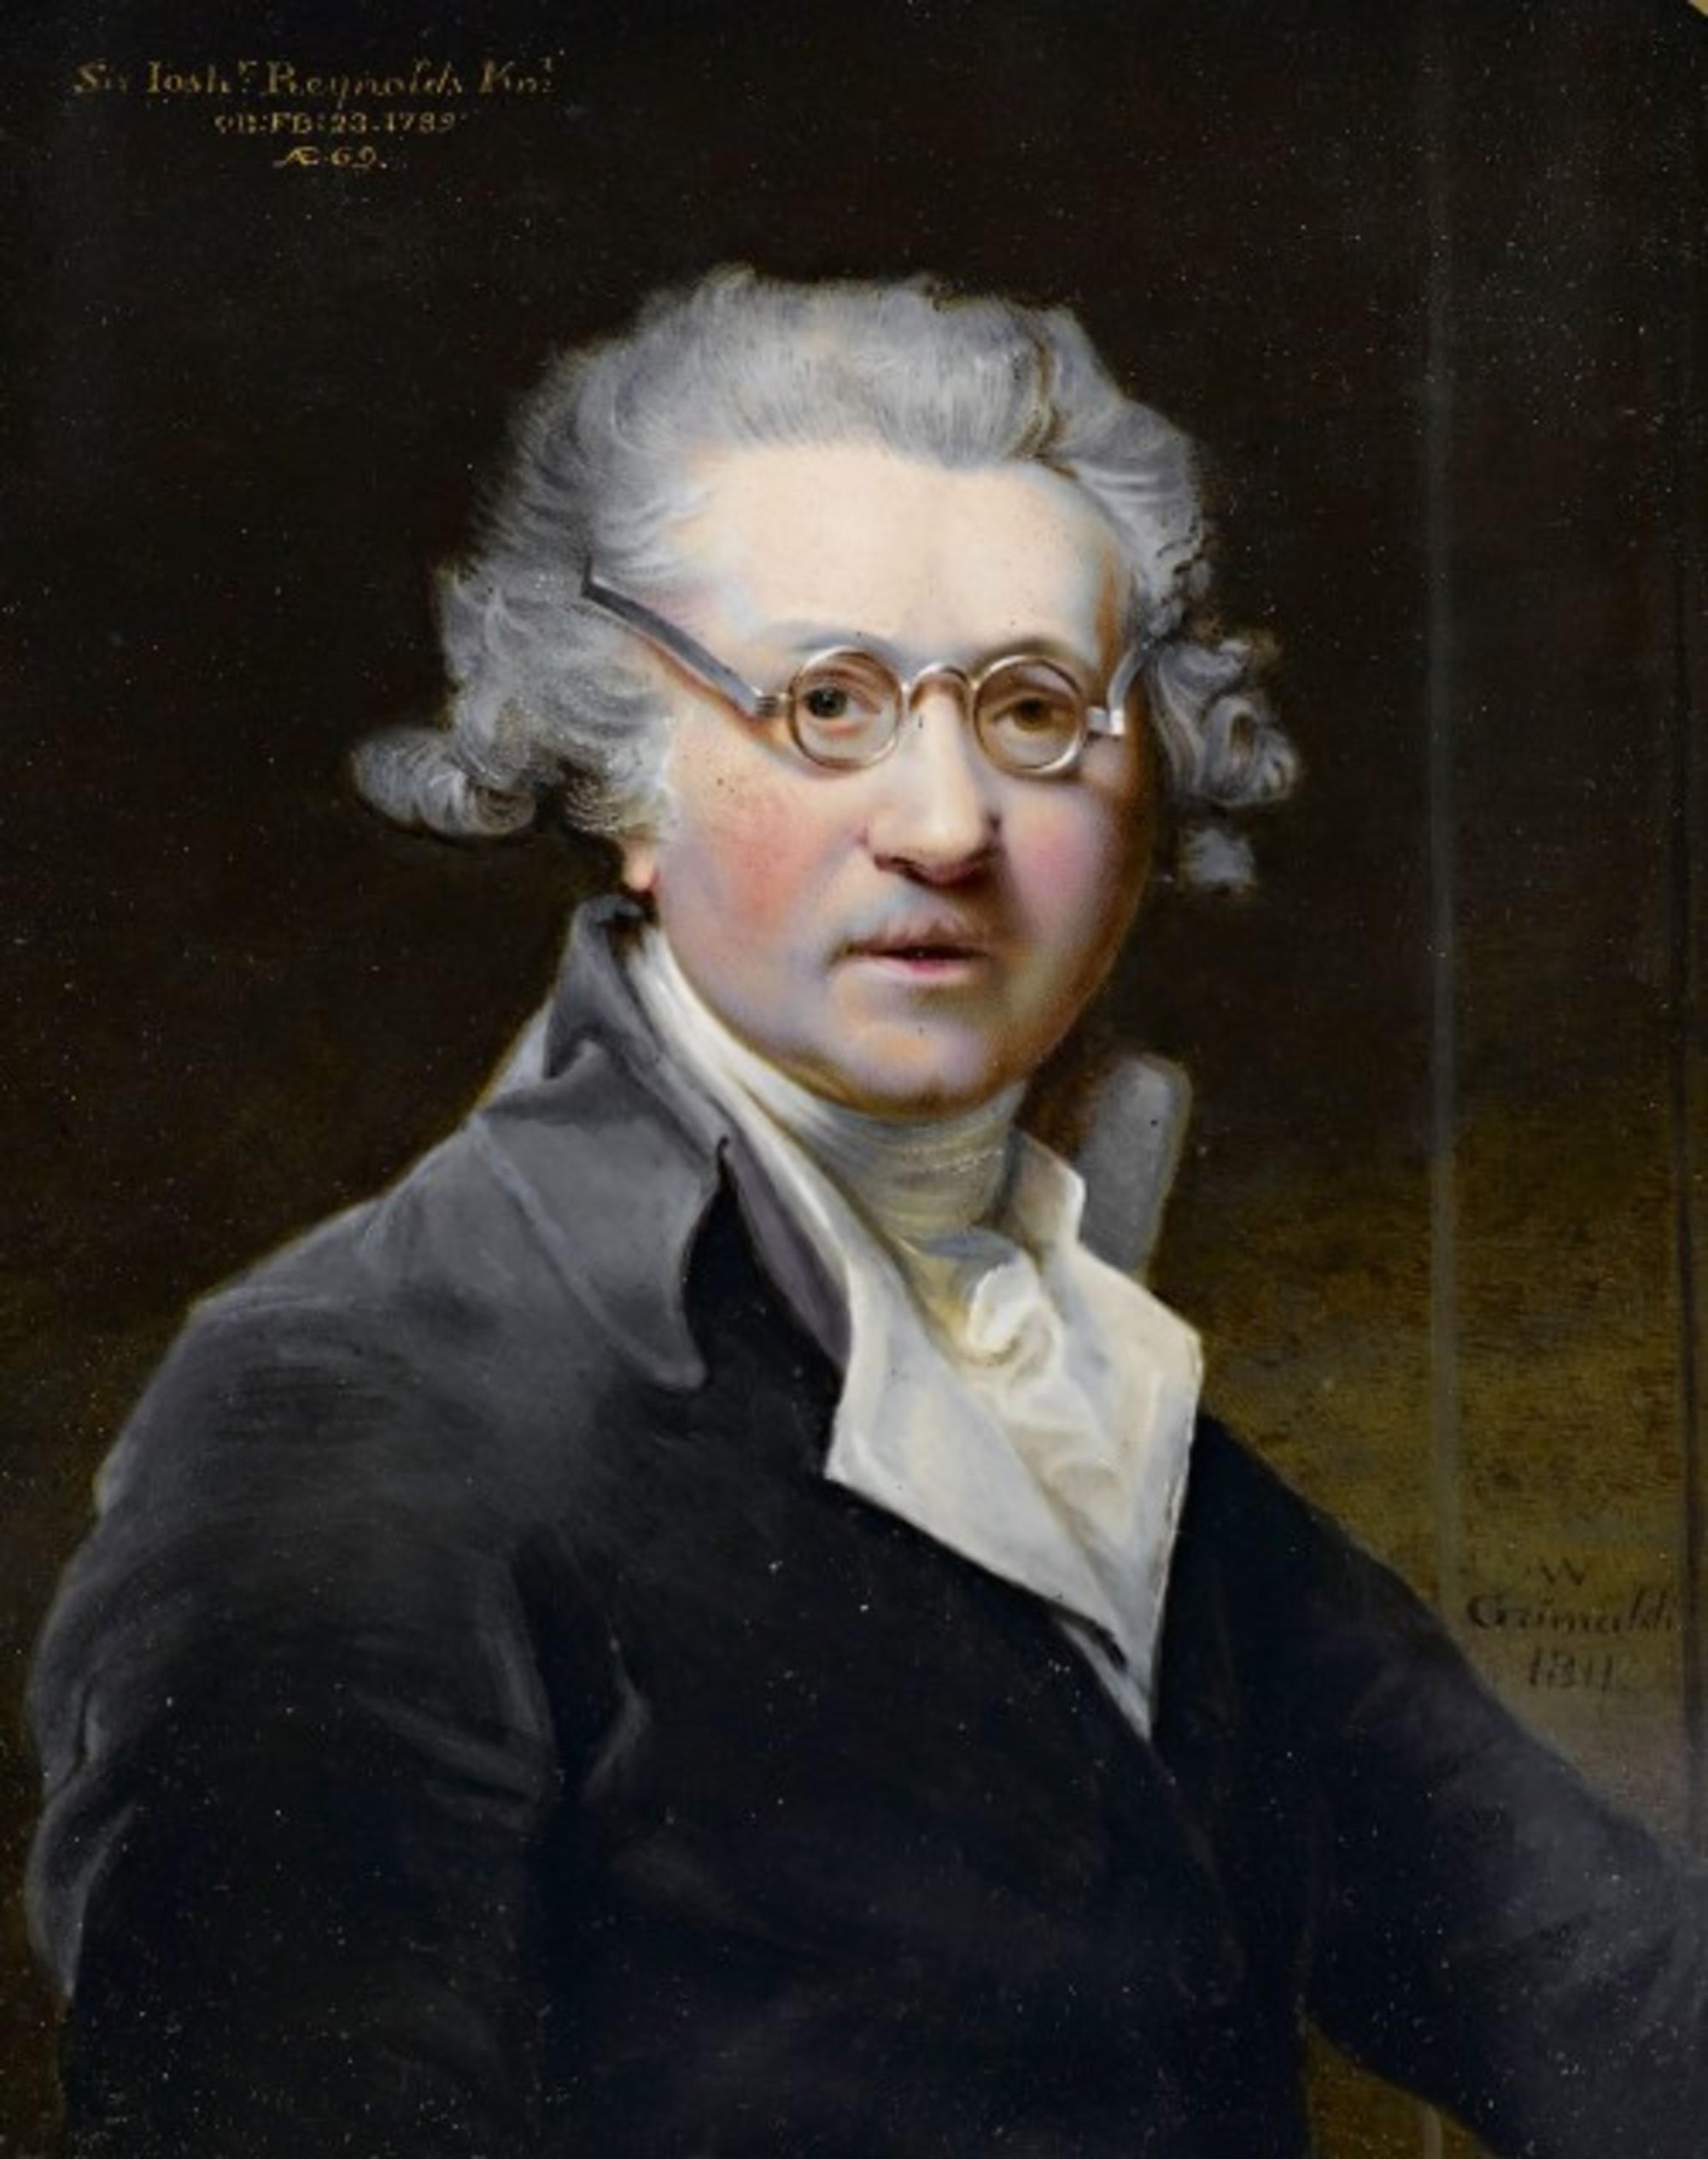 Miniature_Portrait_of_Sir_Joshua_Reynolds_by_William_Grimaldi.jpg